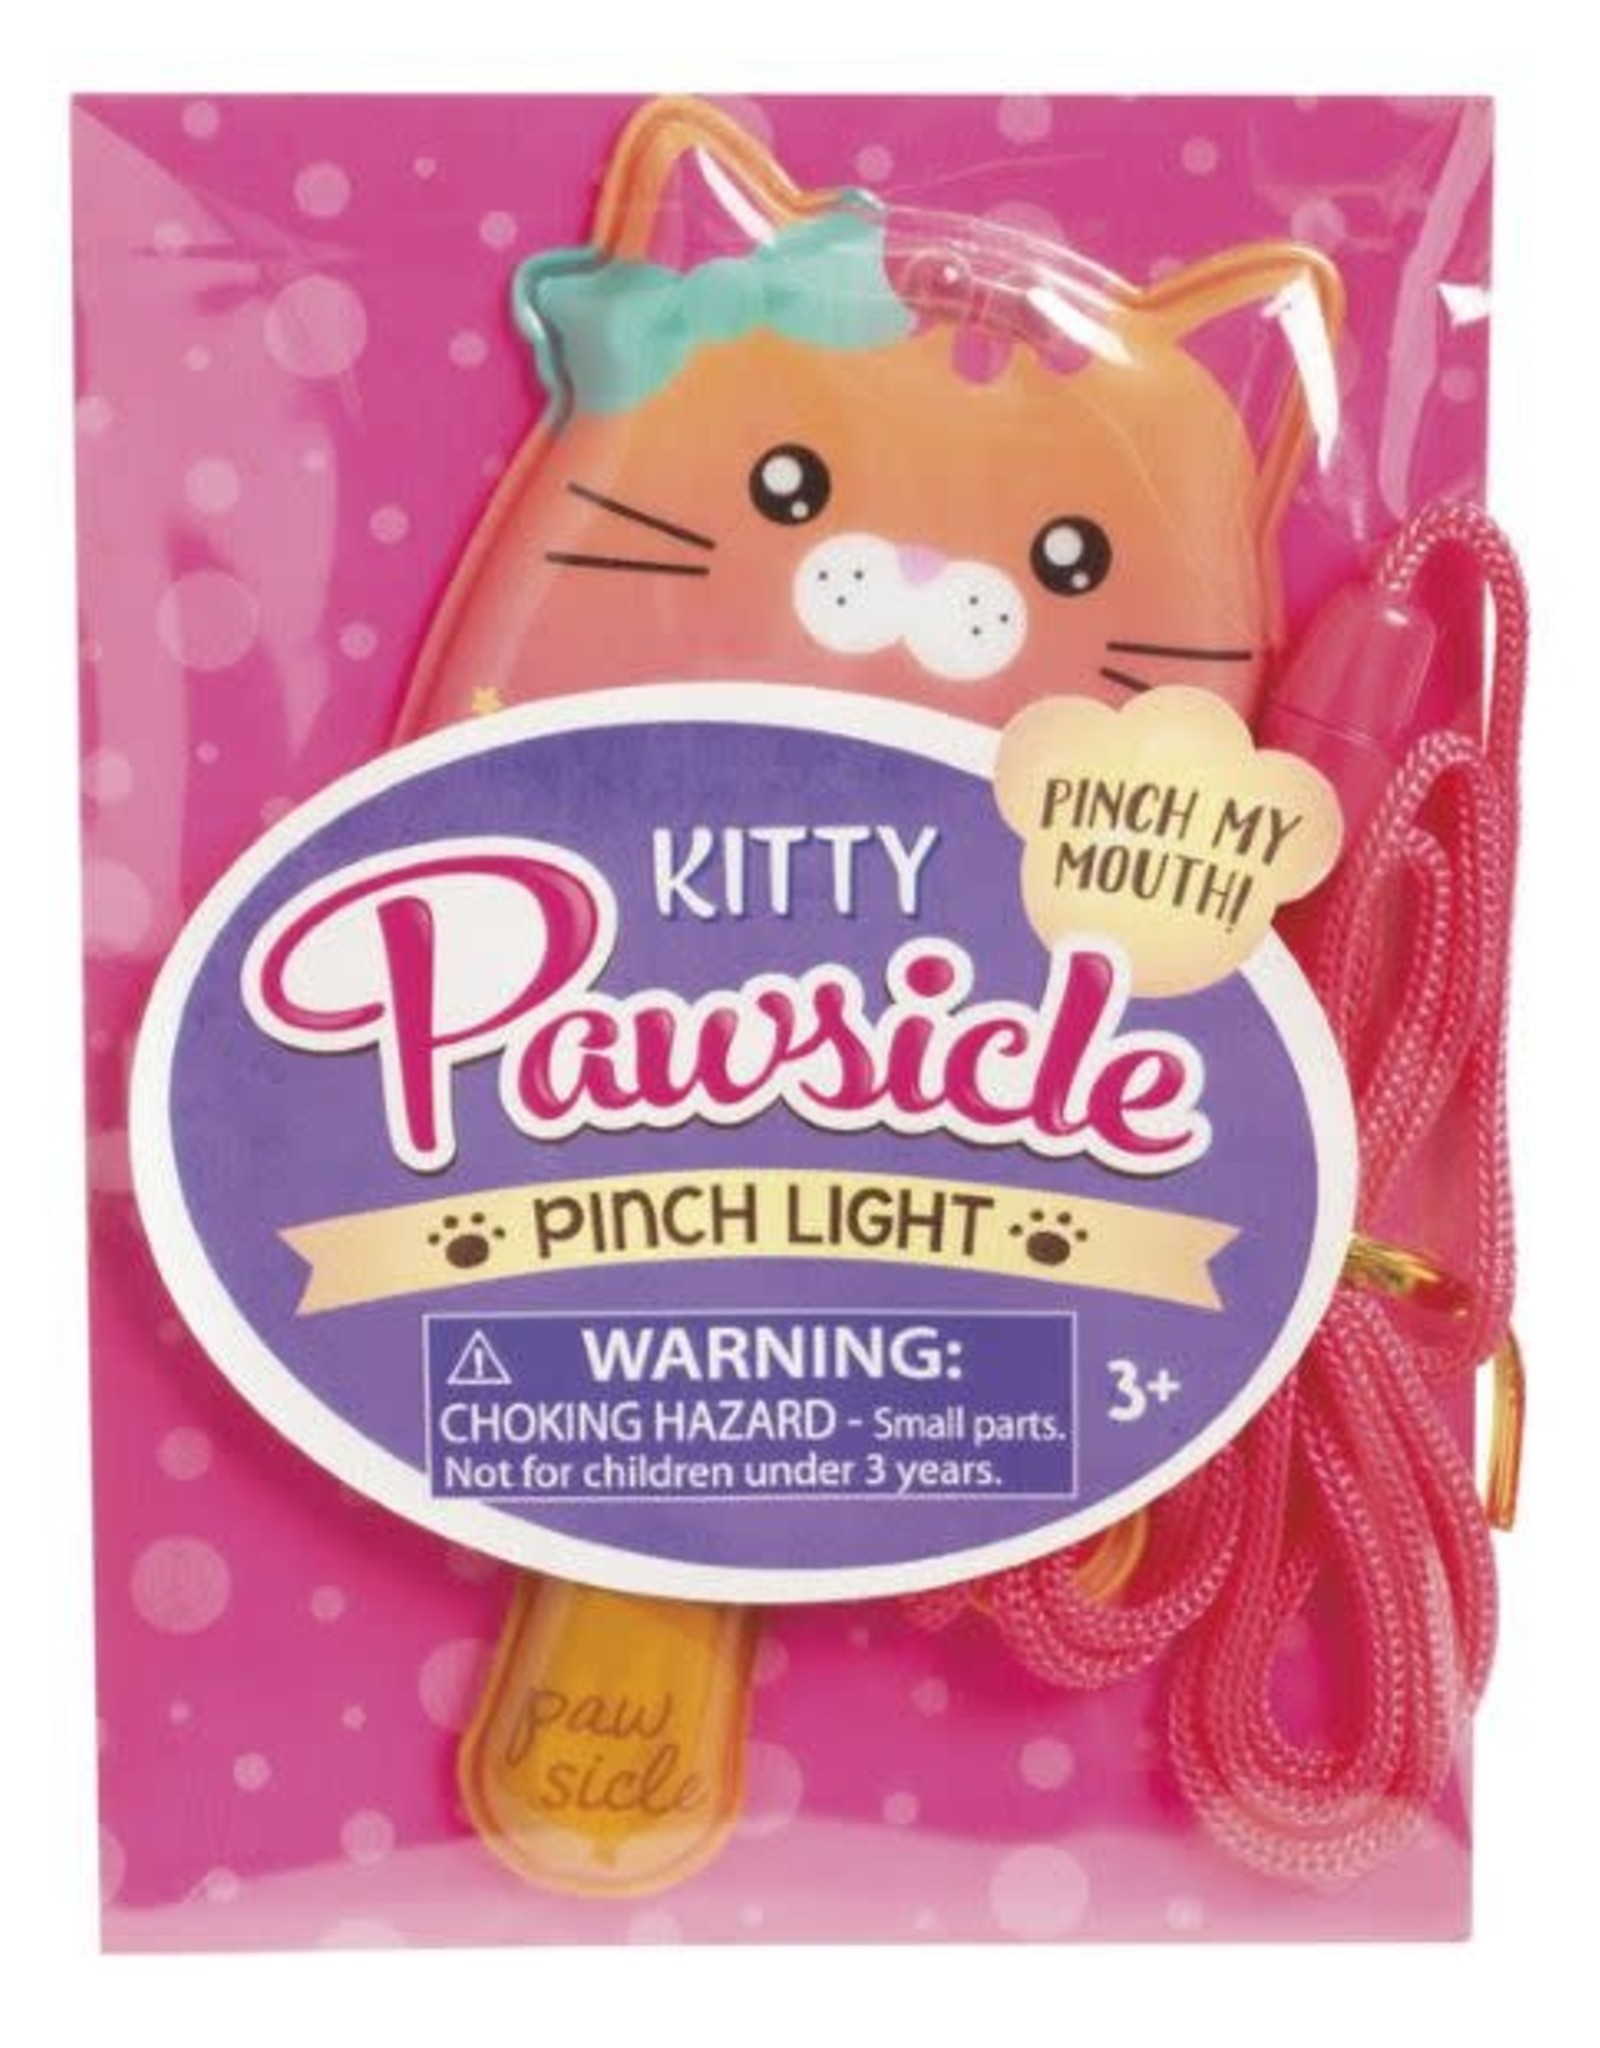 Kitty Pawsicle Pinch Light